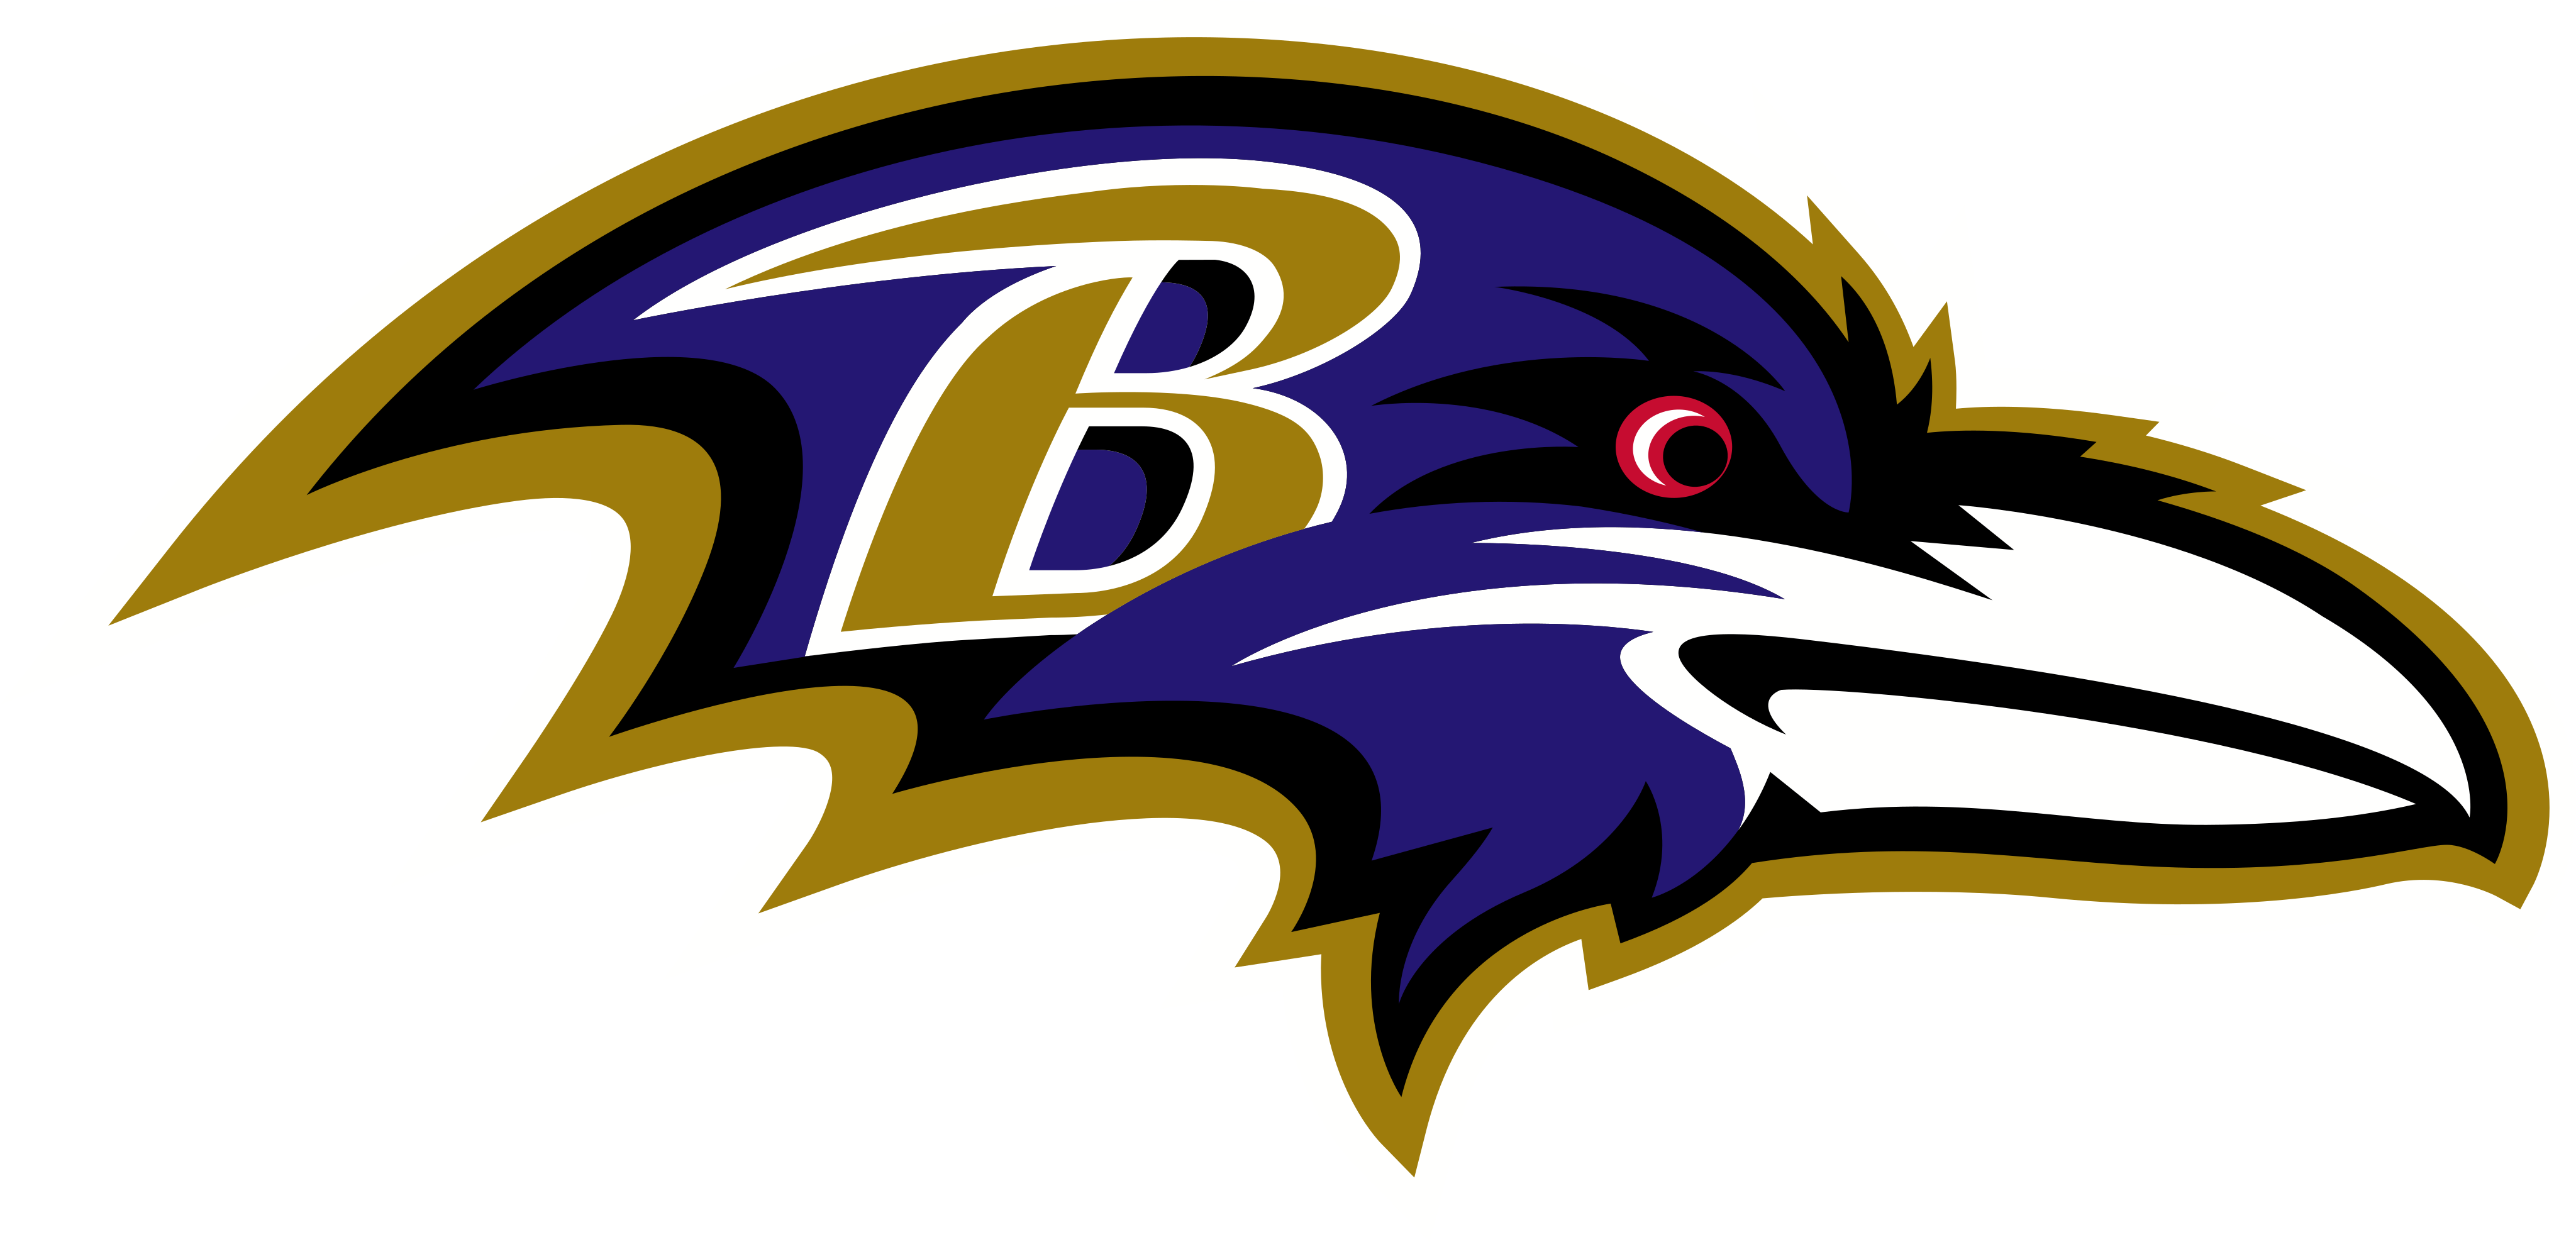 baltimore ravens logo - Baltimore Ravens Logo